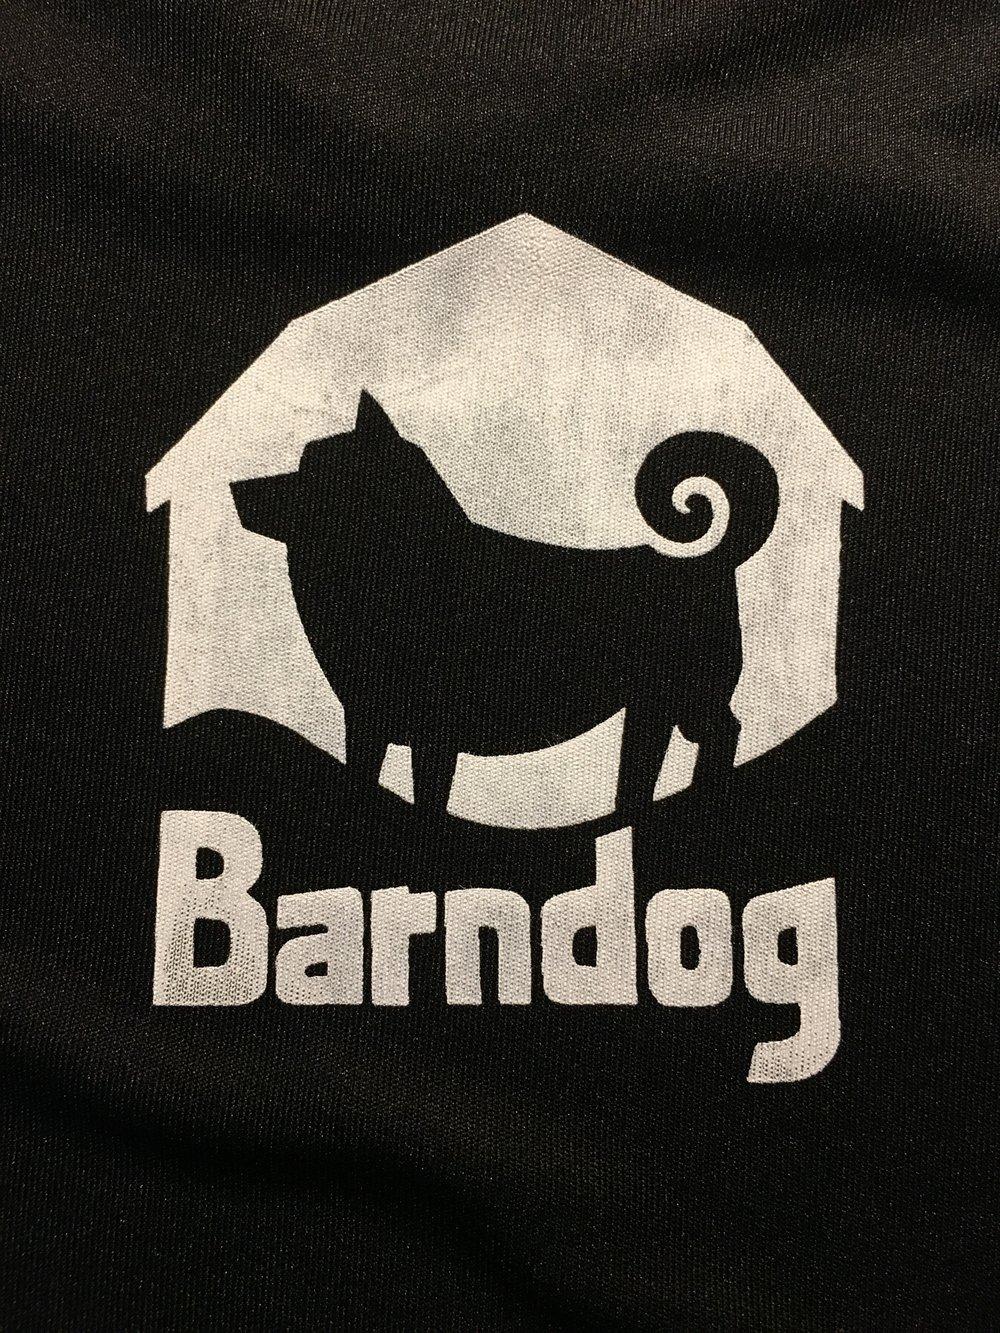 Boonebarndog